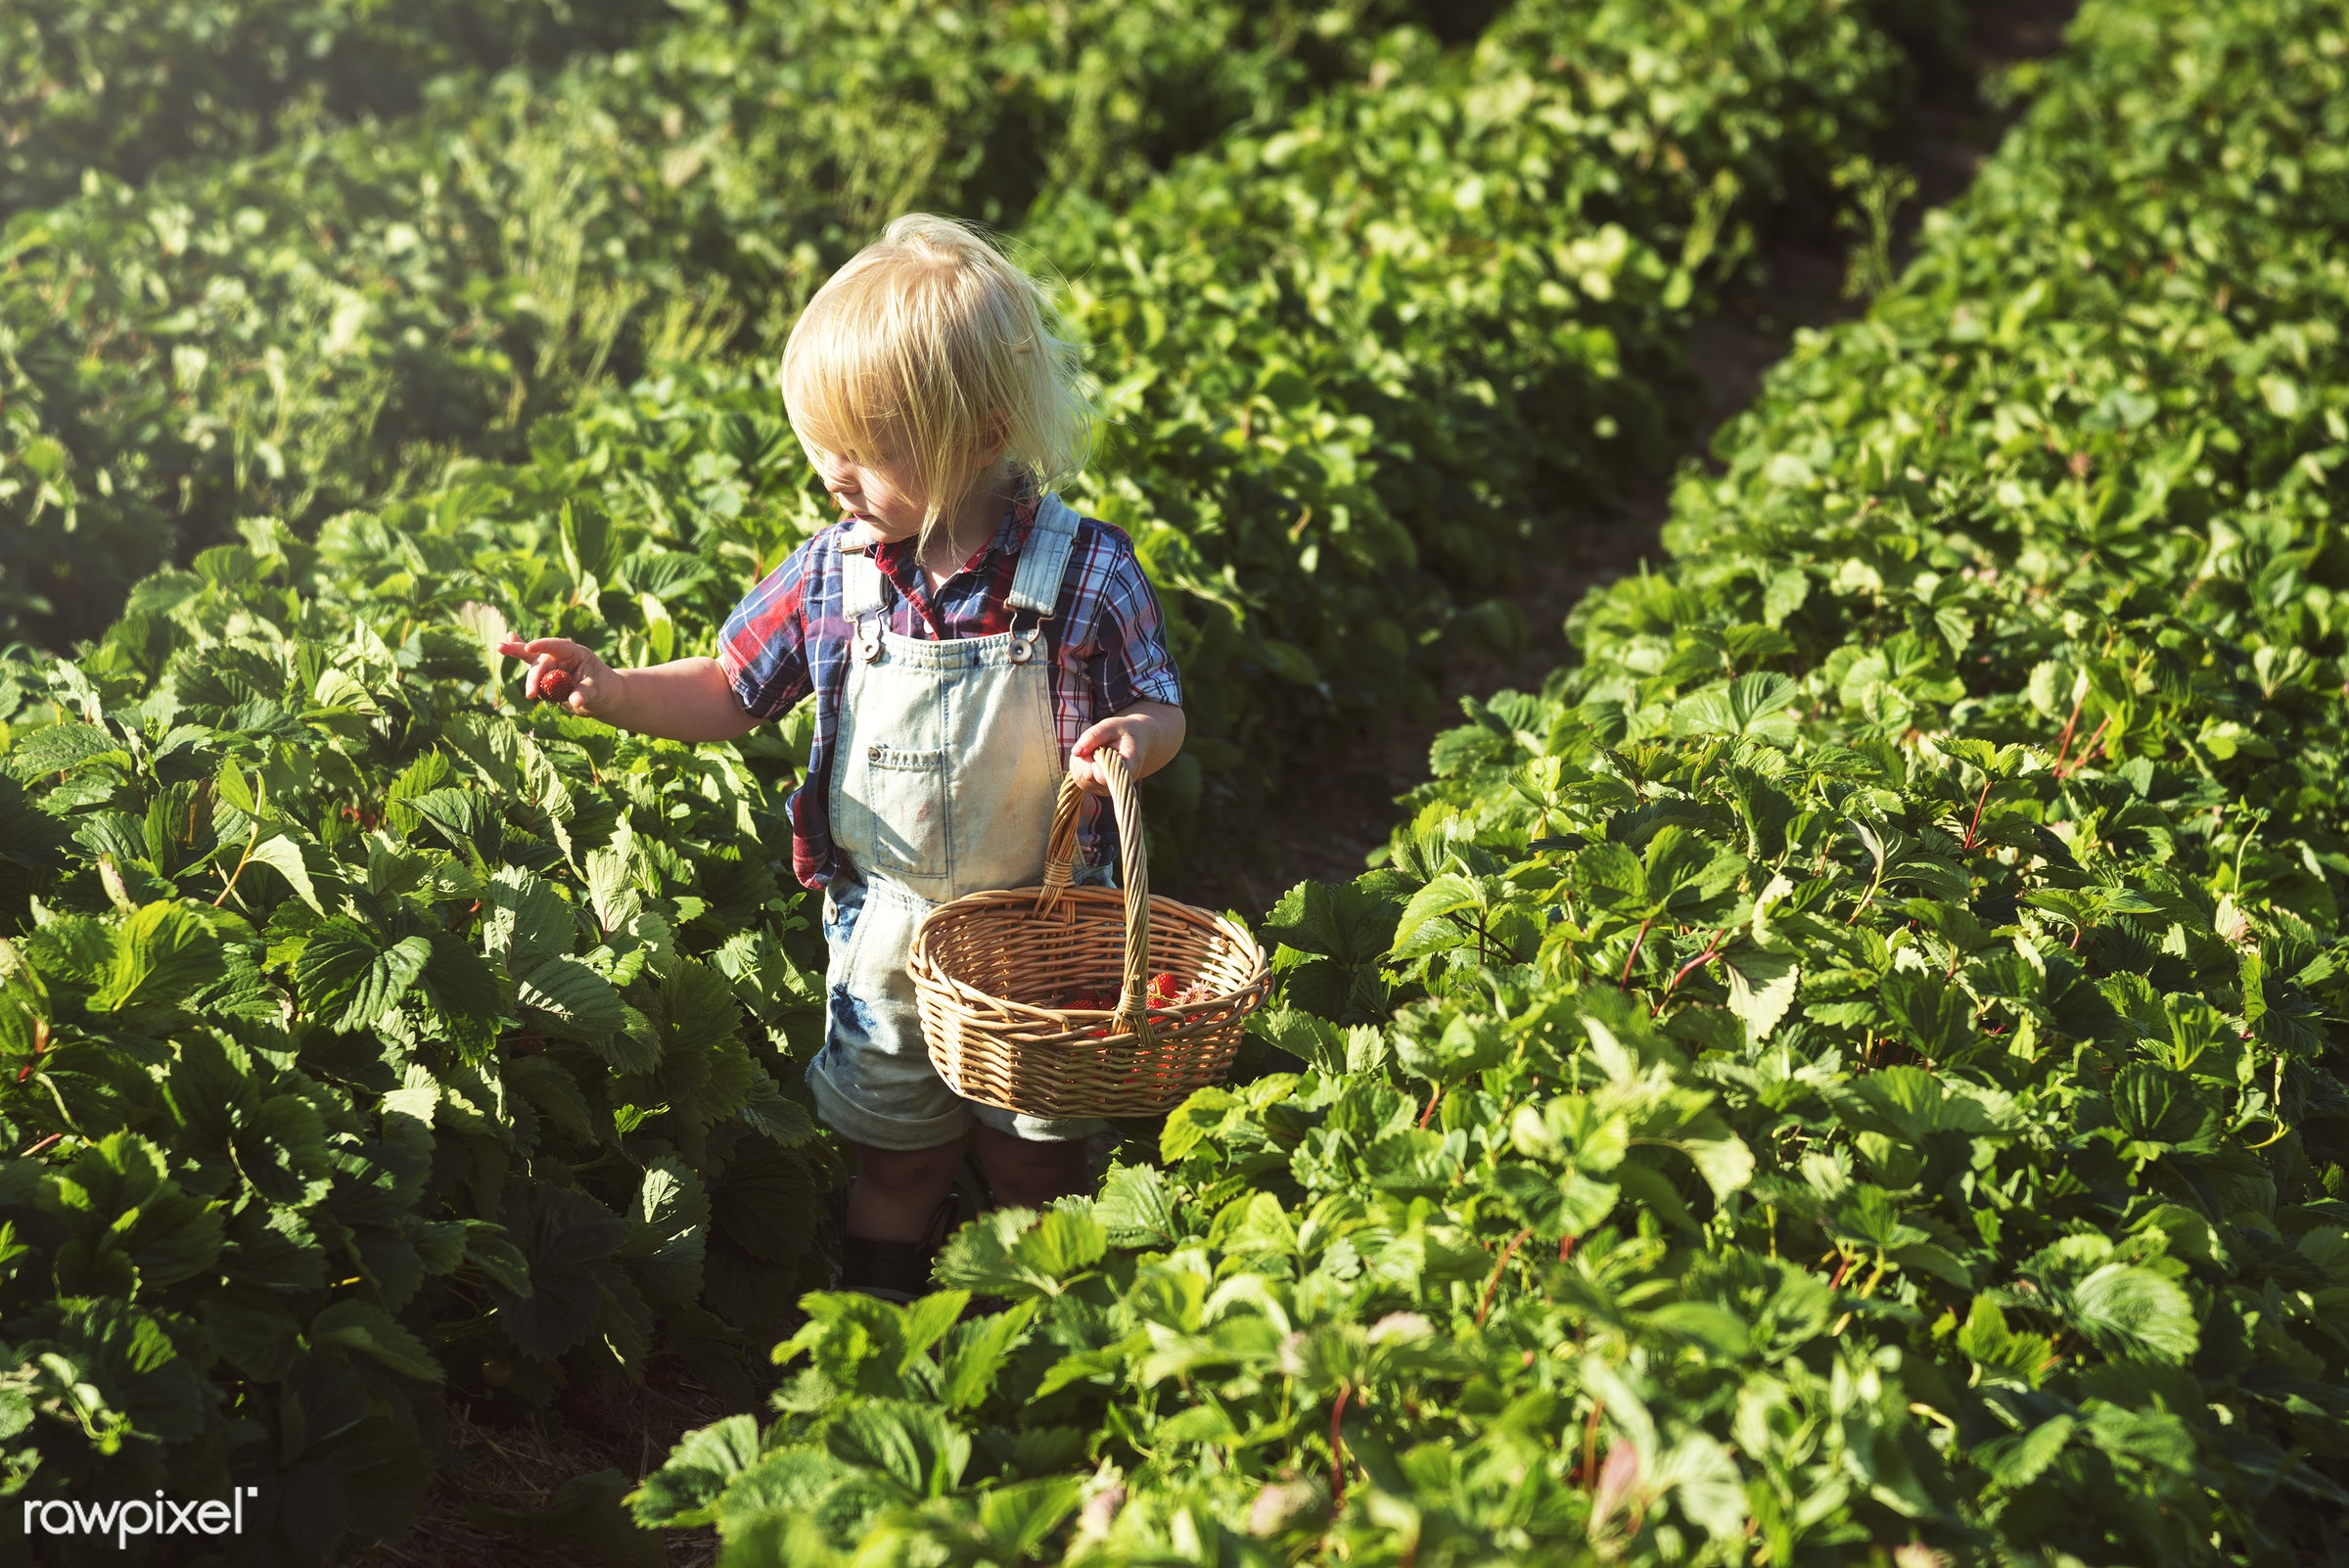 Kid in strawberry farm - alone, backyard, botany, boy, caucasian, countryside, cultivate, farm, field, fresh, fruit, garden...